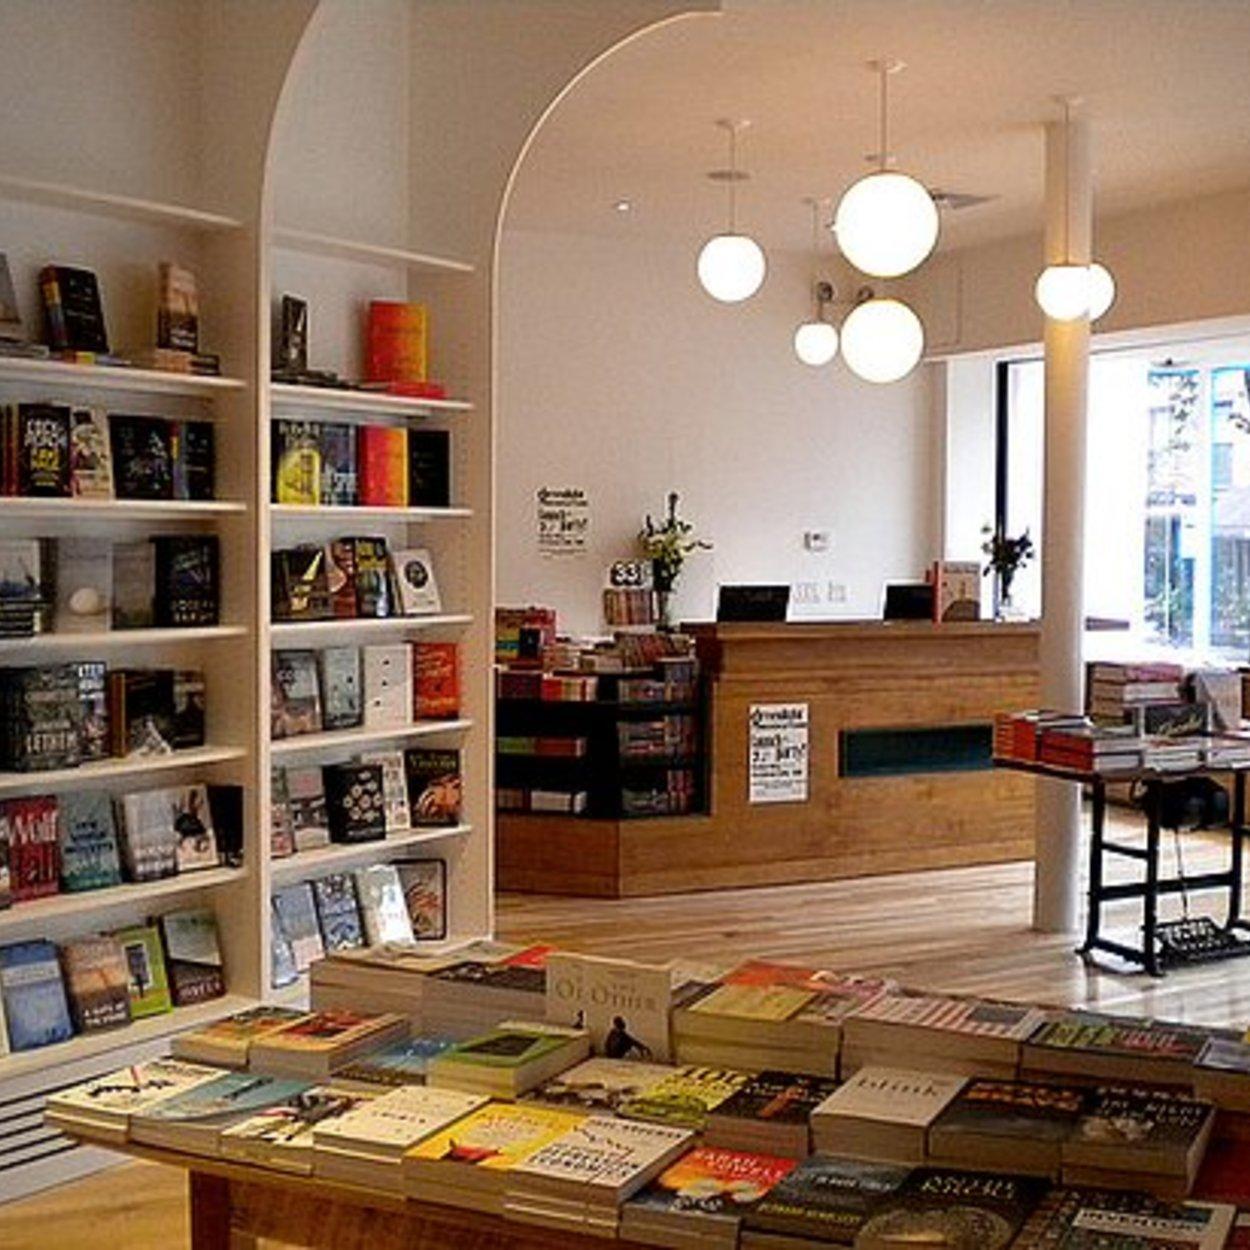 Greenlight bookstore nyc dot popsugar dot com